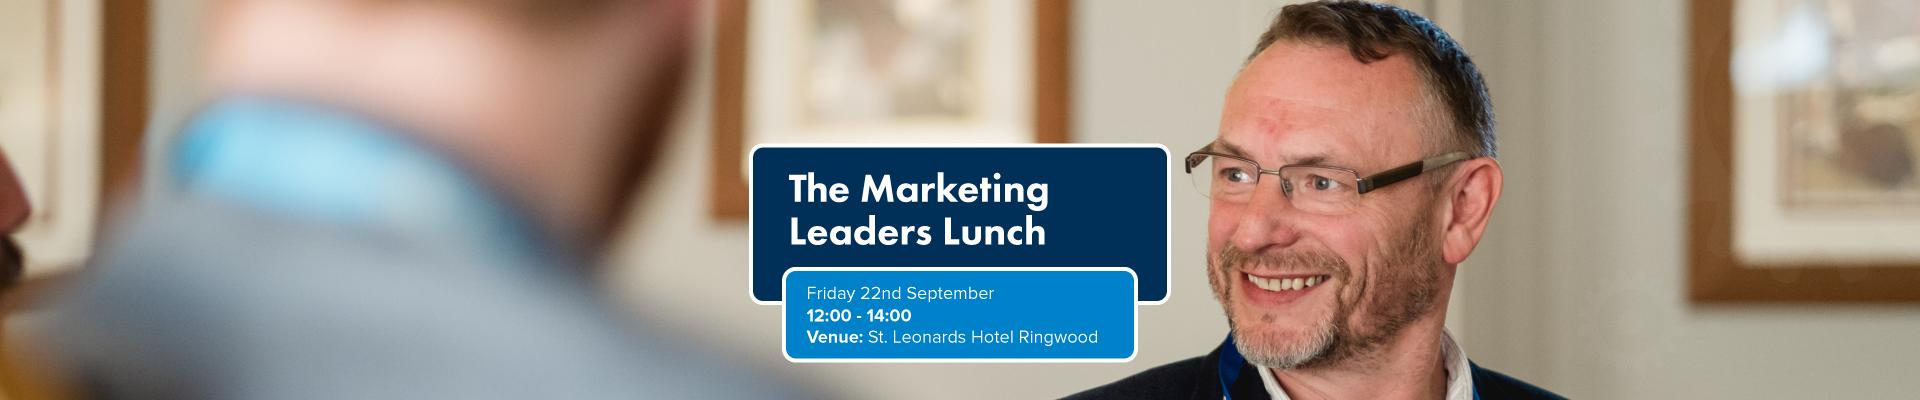 Marketing-Leaders-Lunch-September-2017_Banner_1.png